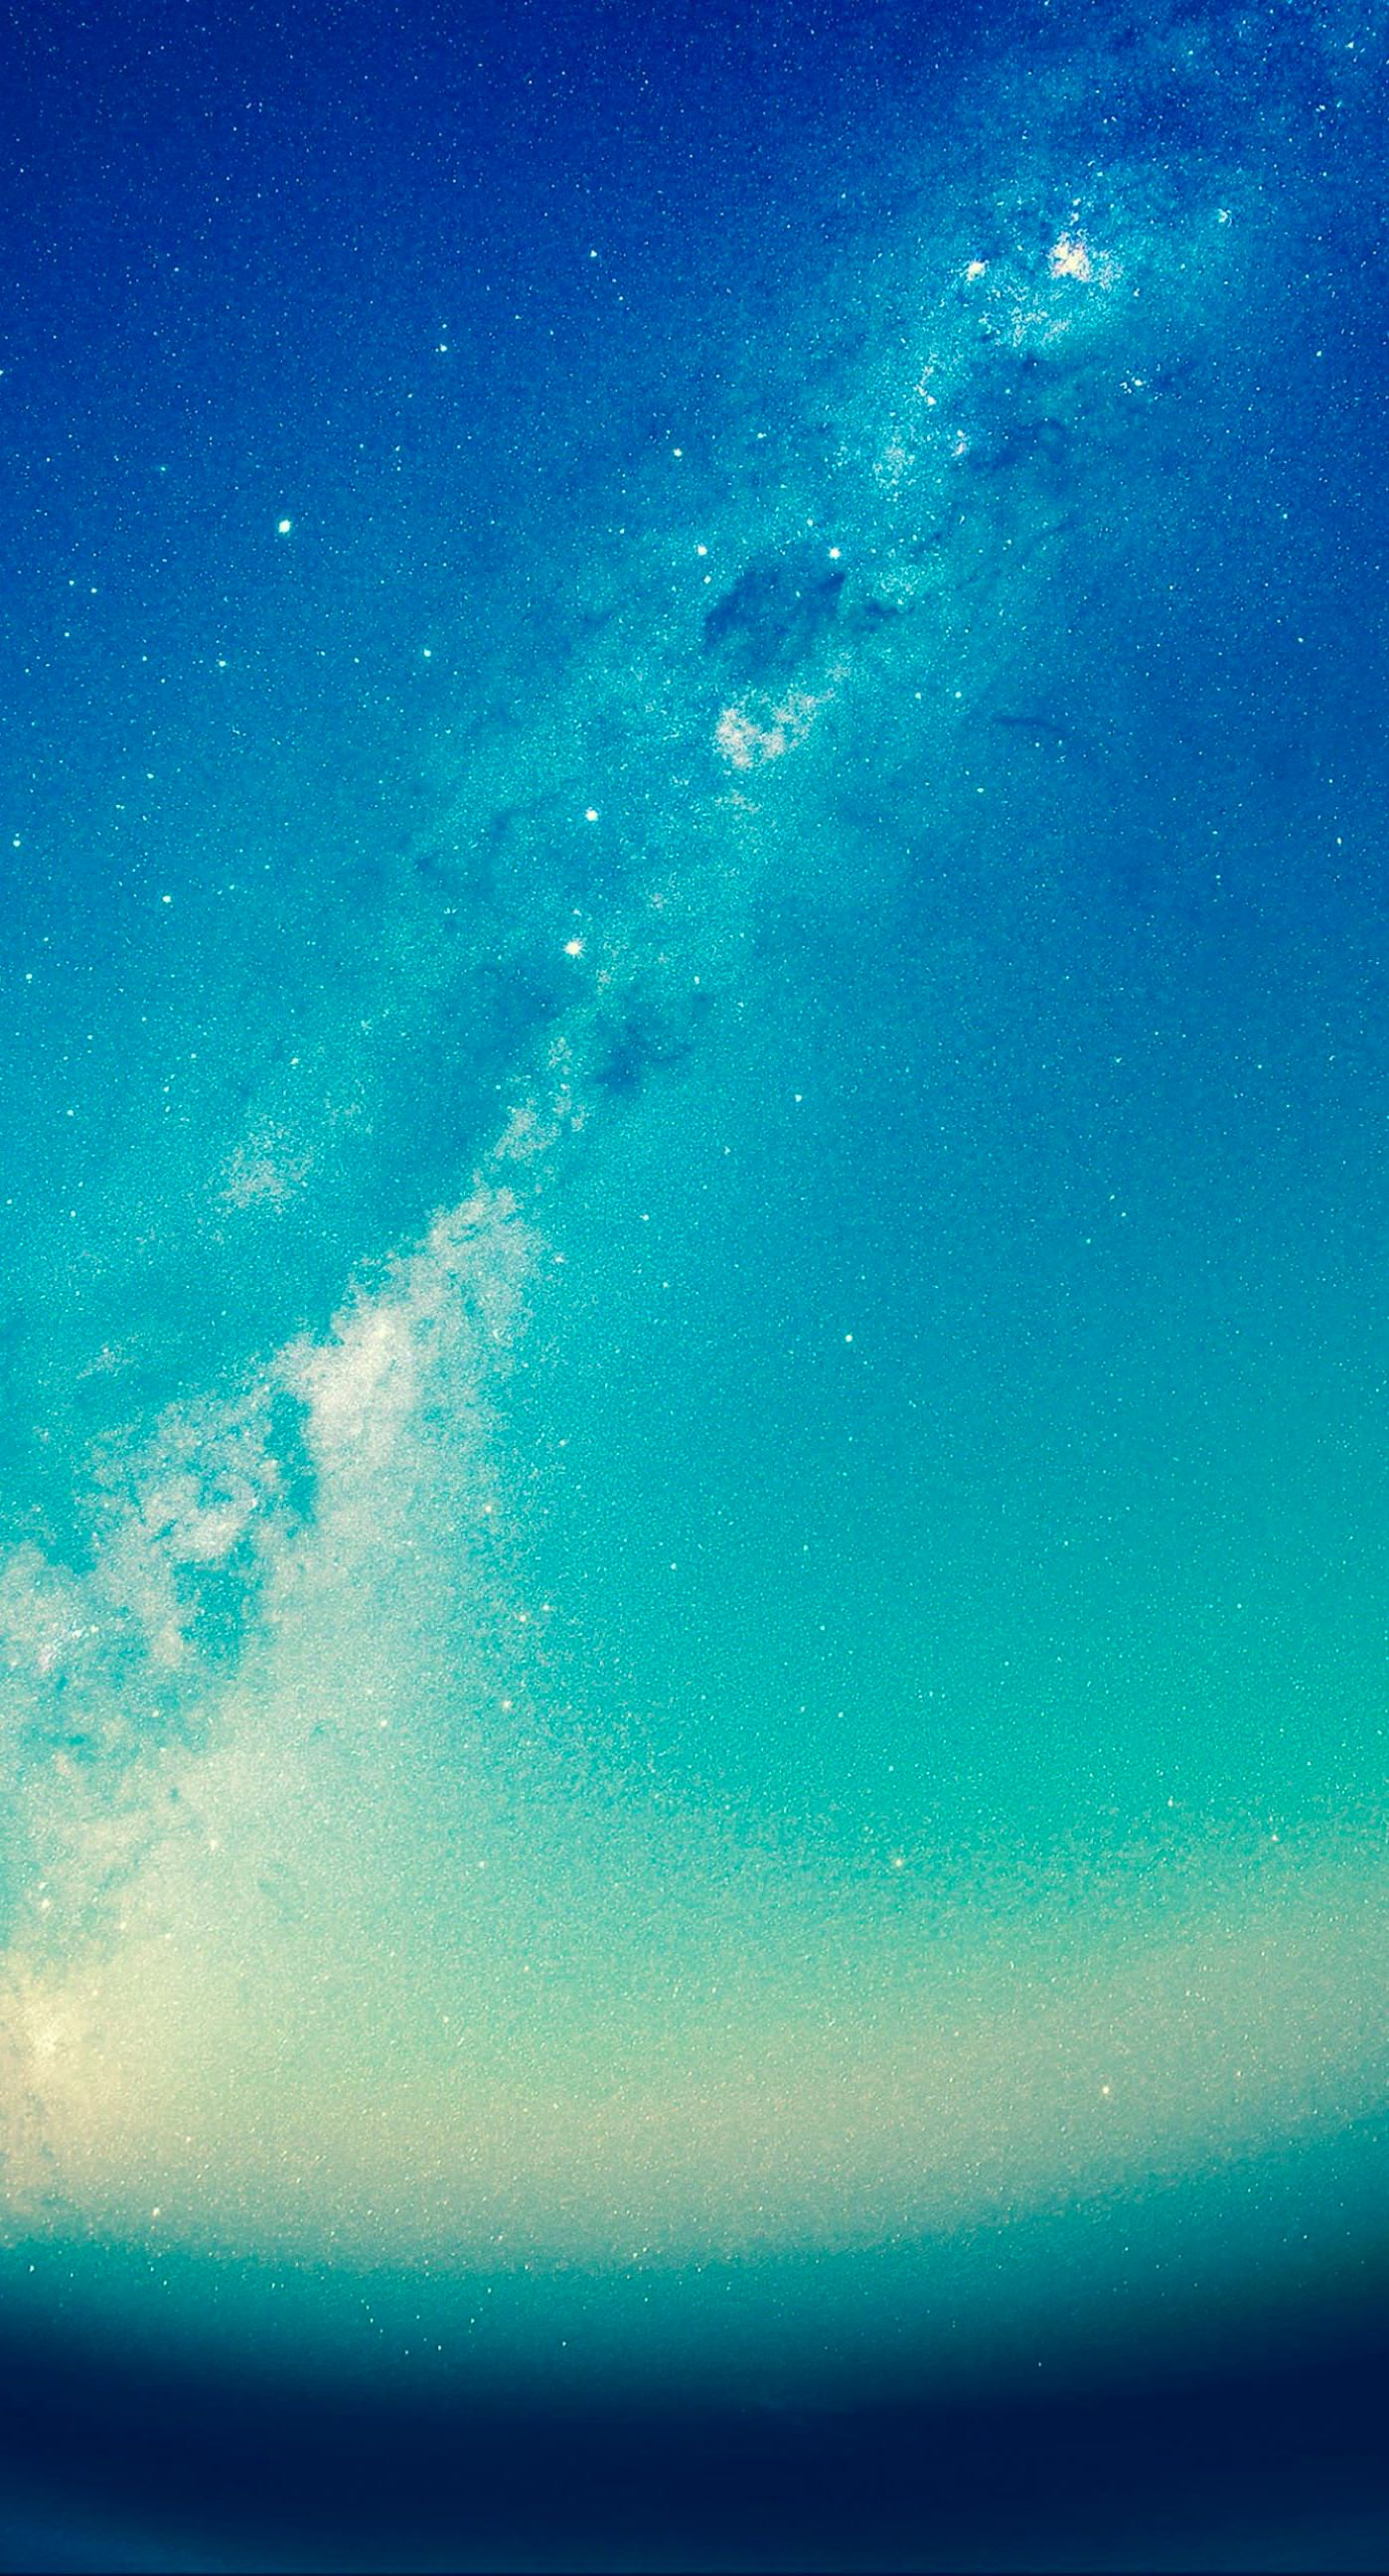 Cosmic Sky Wallpaper Sc Iphone6splus